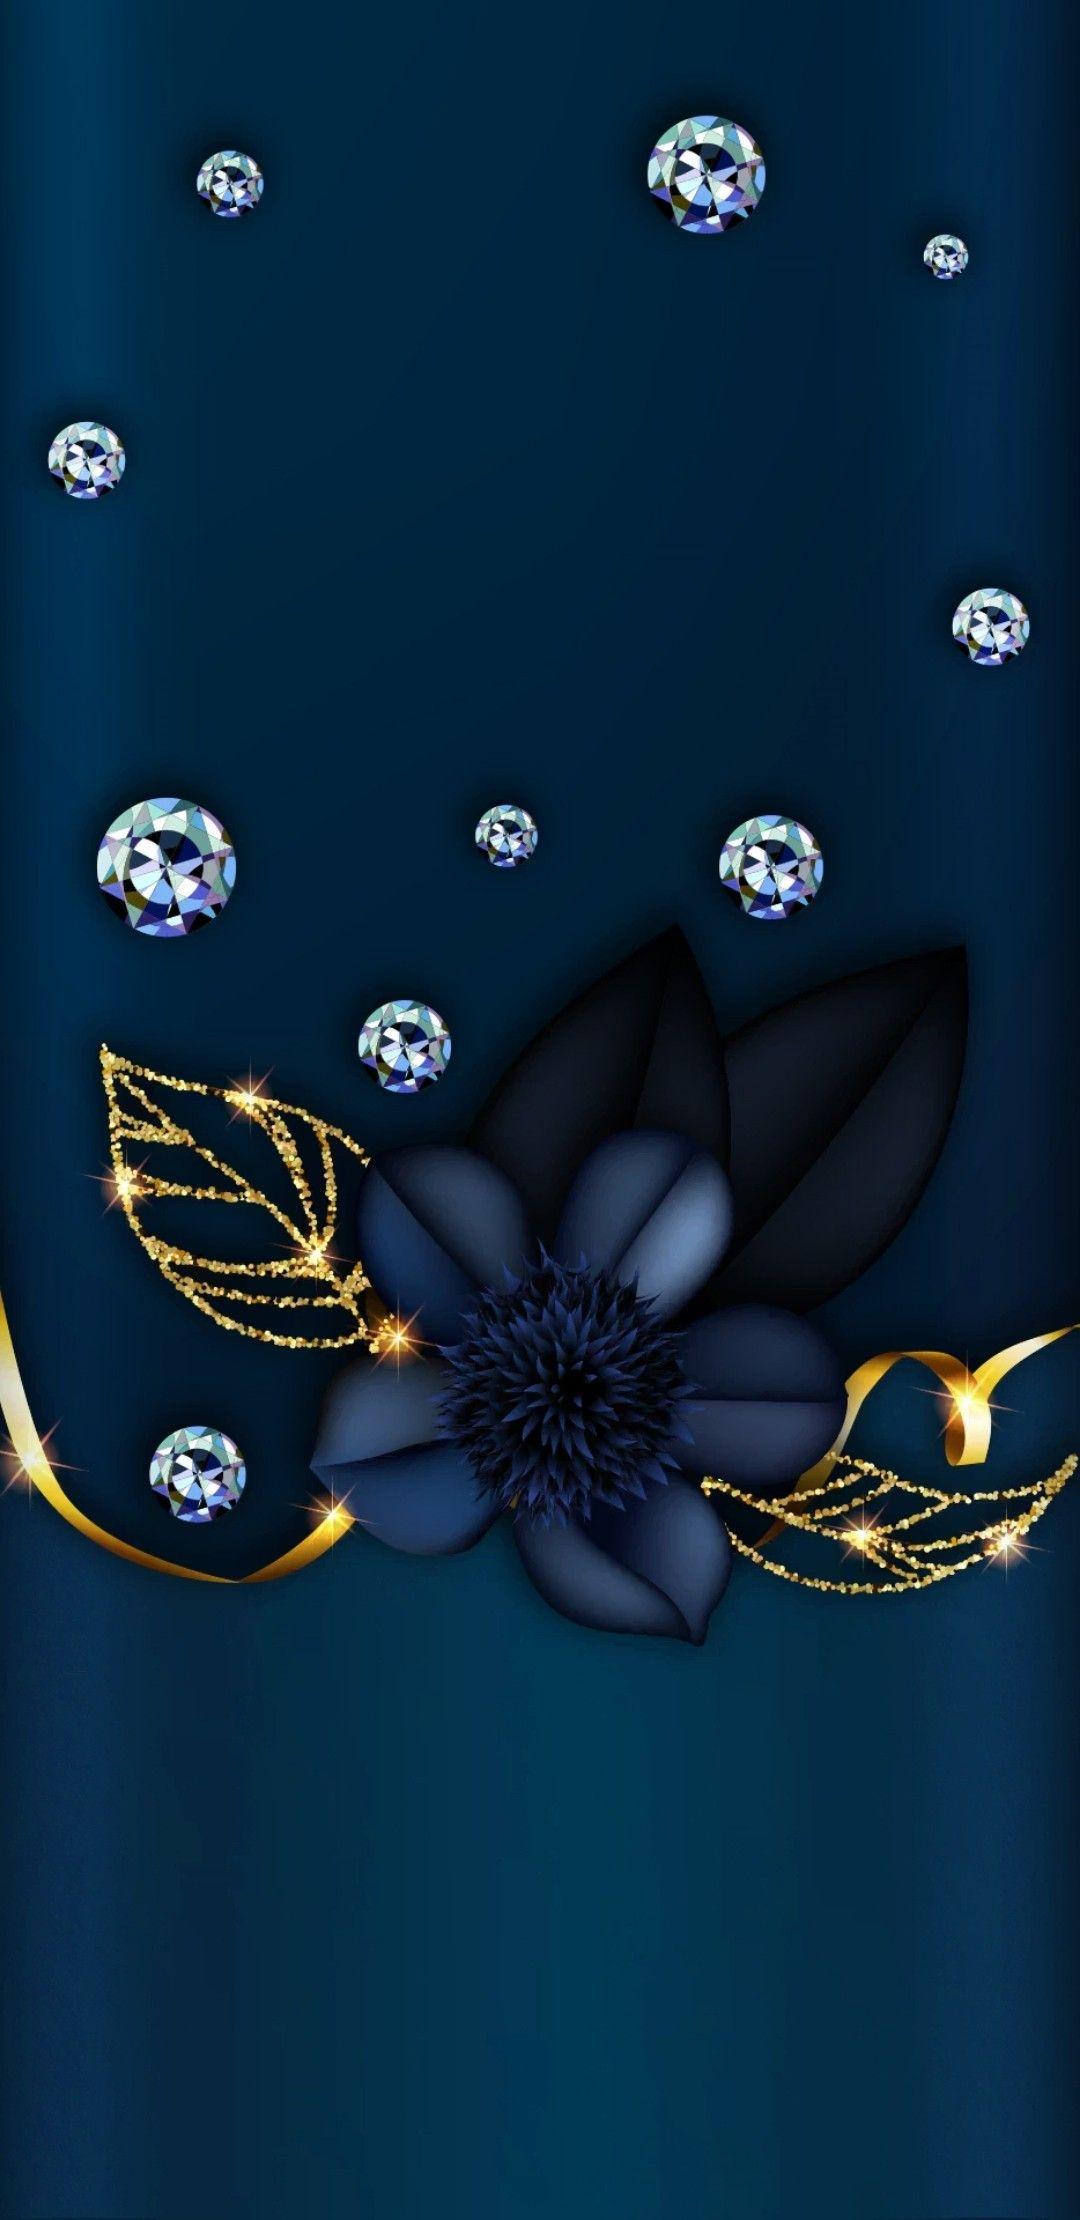 Bling Wallpaper, Luxury Wallpaper, Heart Wallpaper, Wallpaper Backgrounds, Blue Wallpapers, Wallpaper